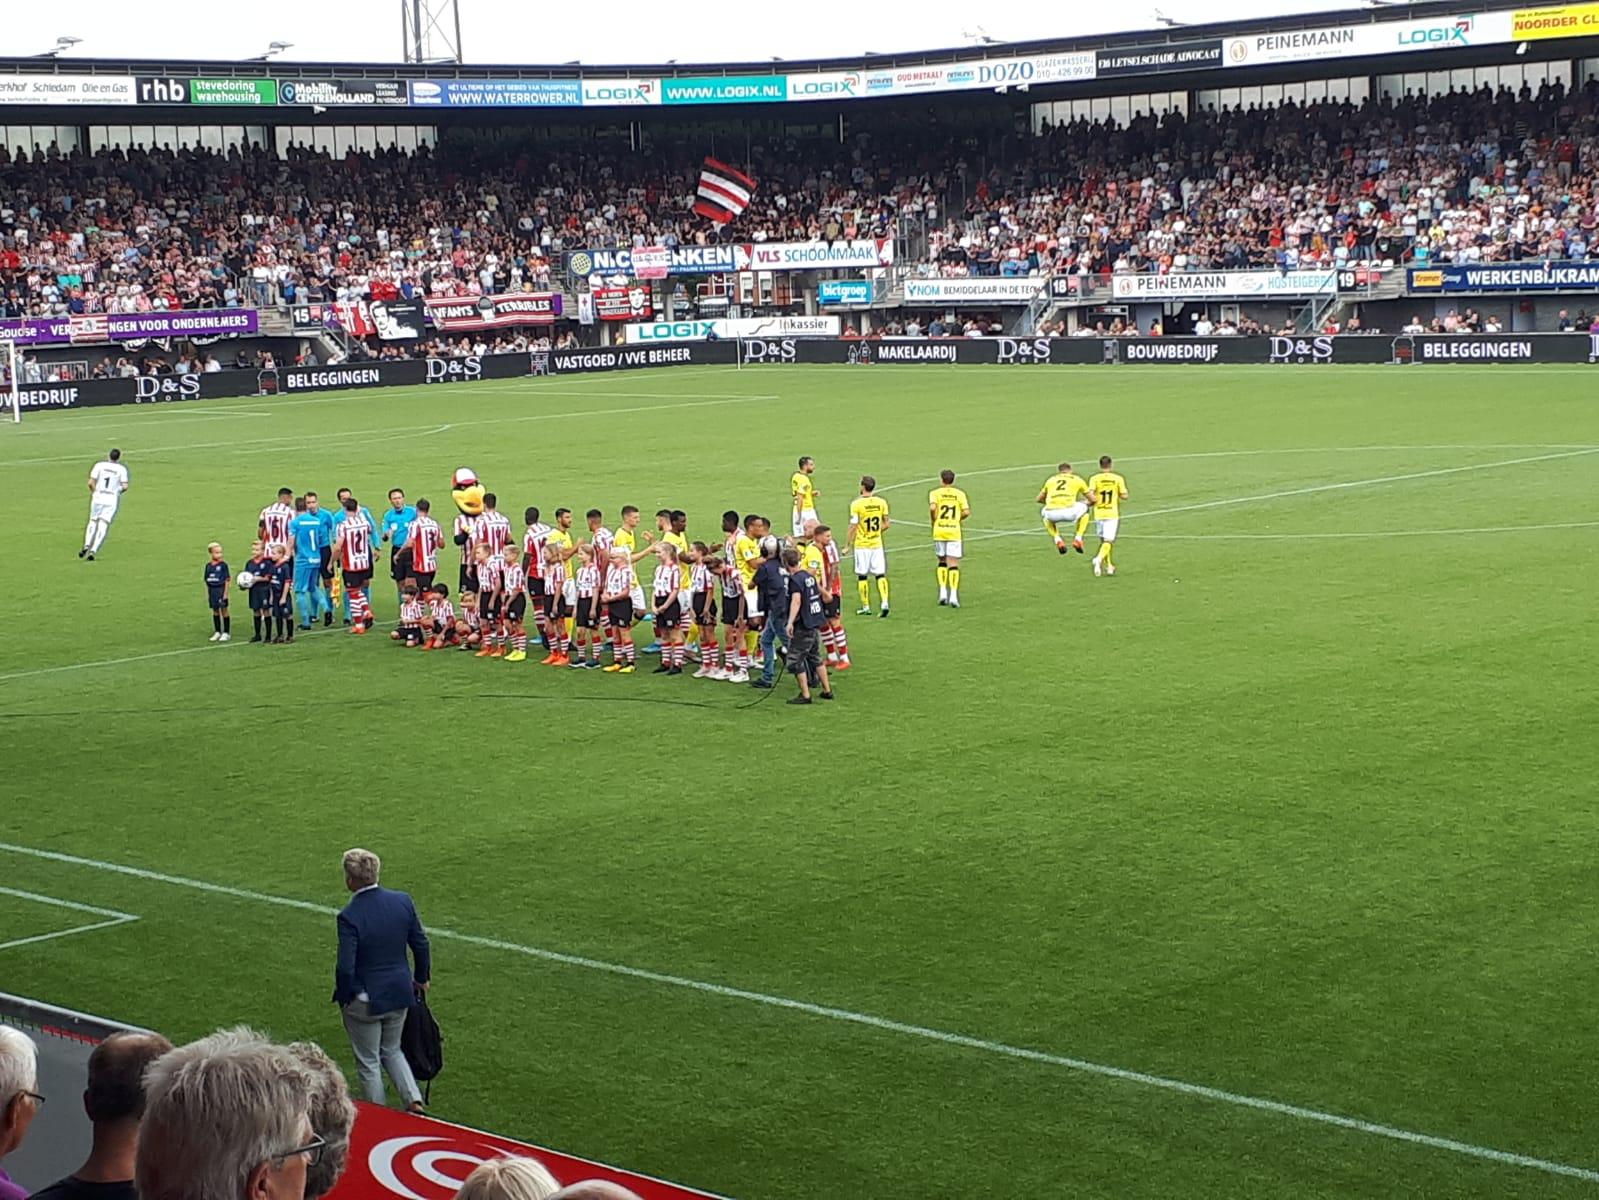 Geslaagde sponsoravond VV Naaldwijk bij Sparta - VVV